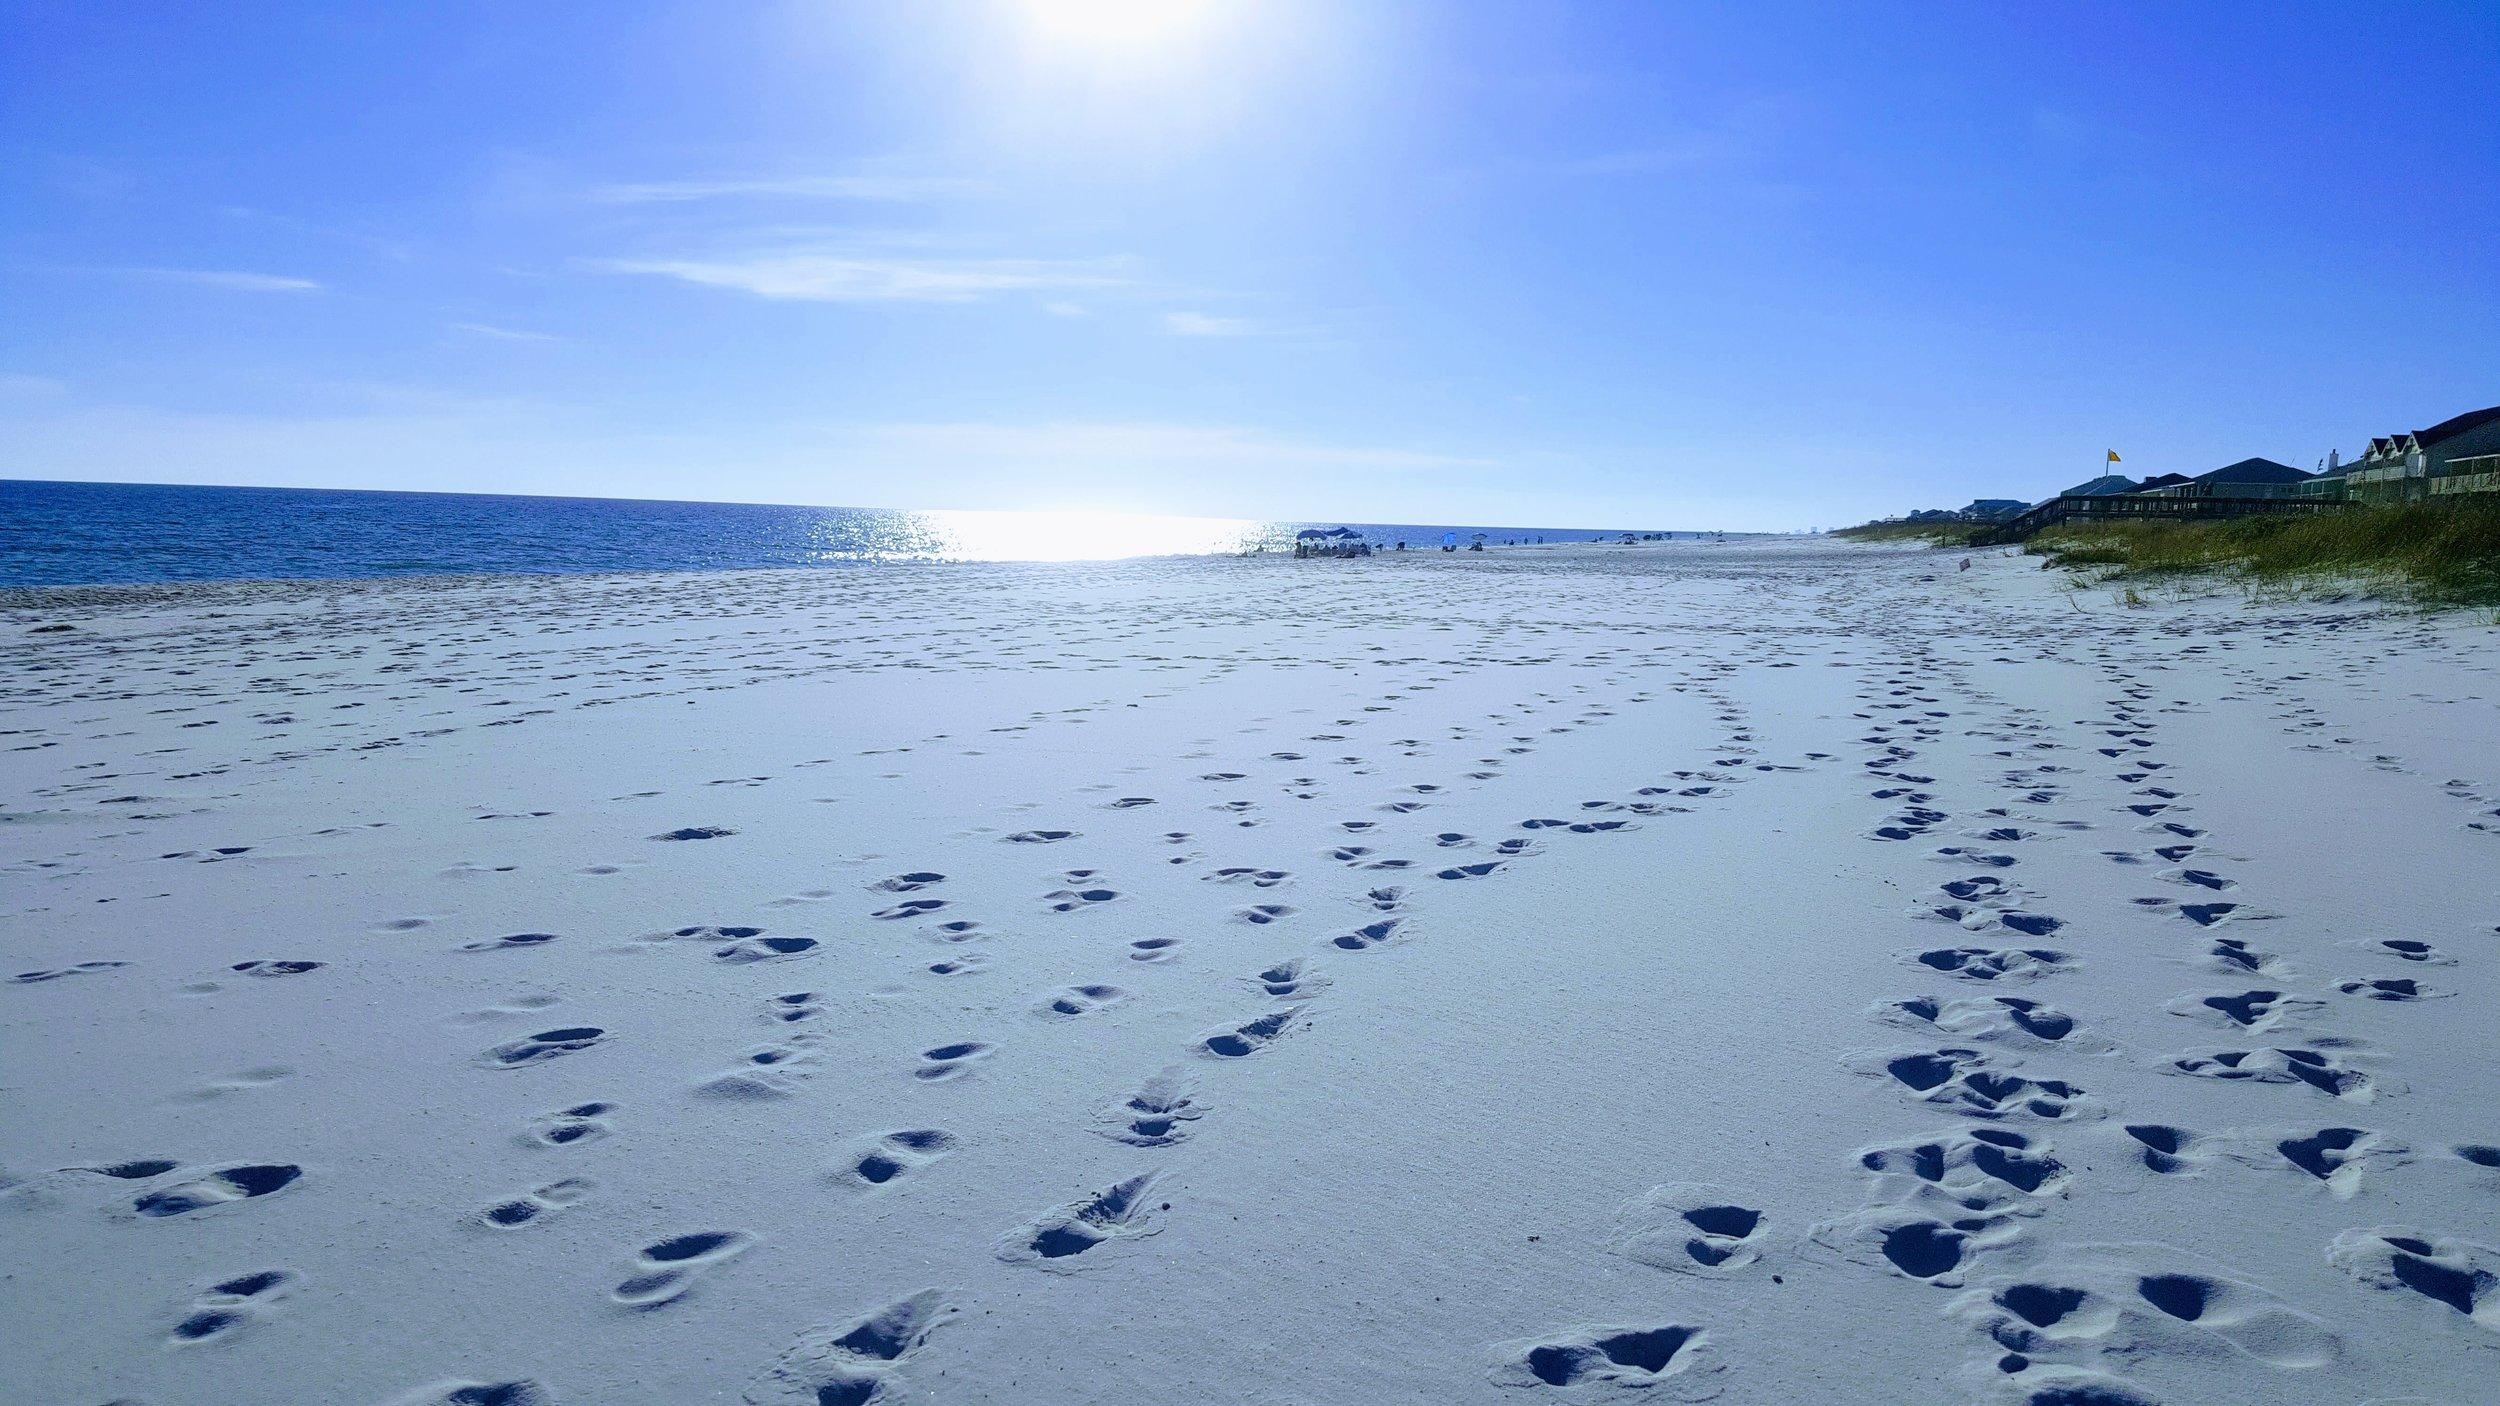 Matthew Albertell Photography Footsteps in the sand.jpg